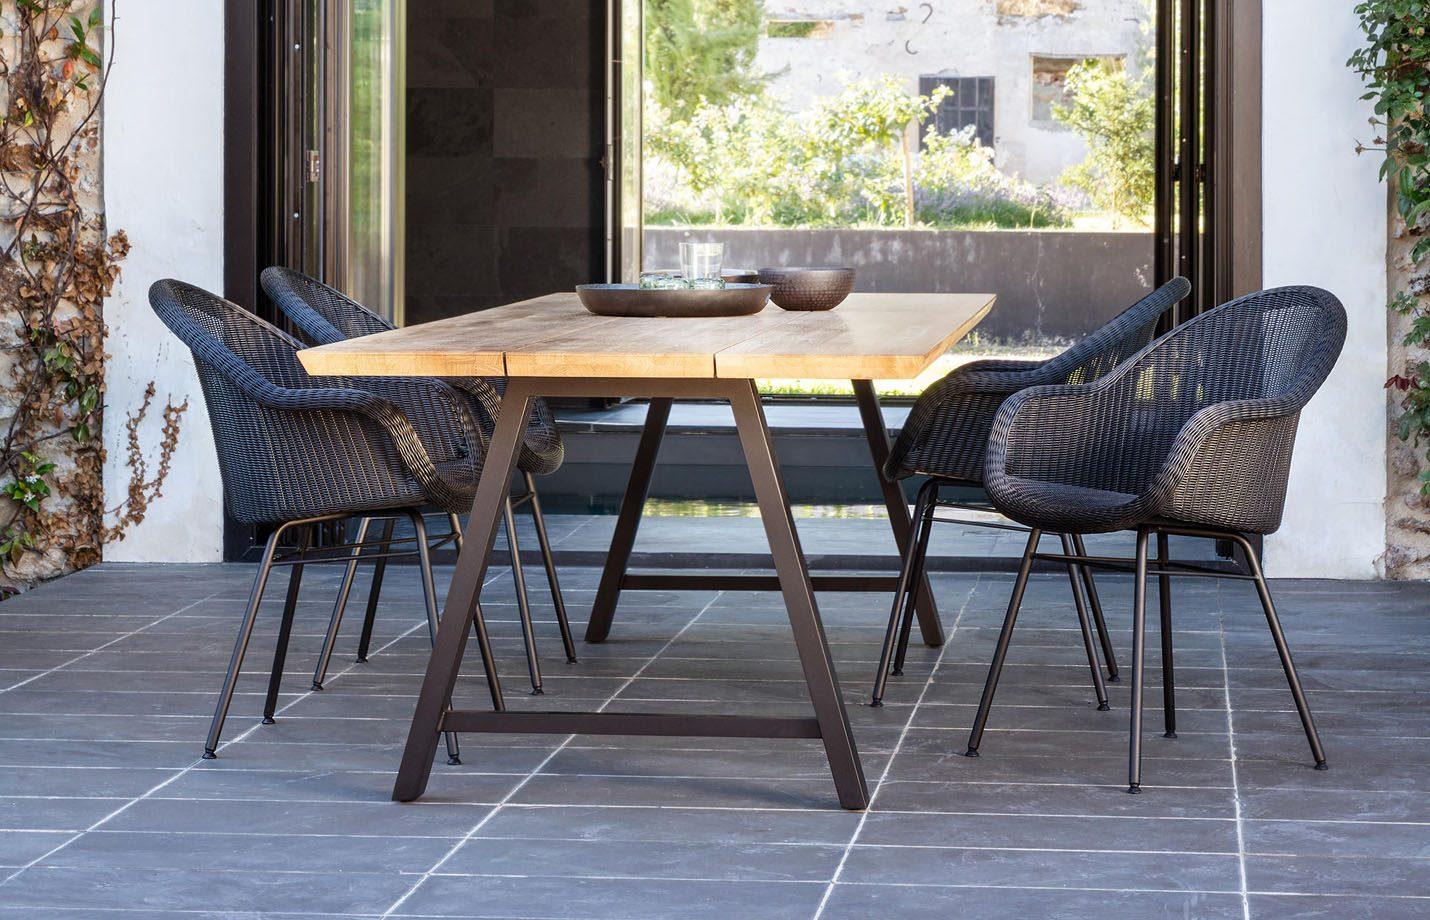 Edgard-dining-chair-black-steel-base-LS01